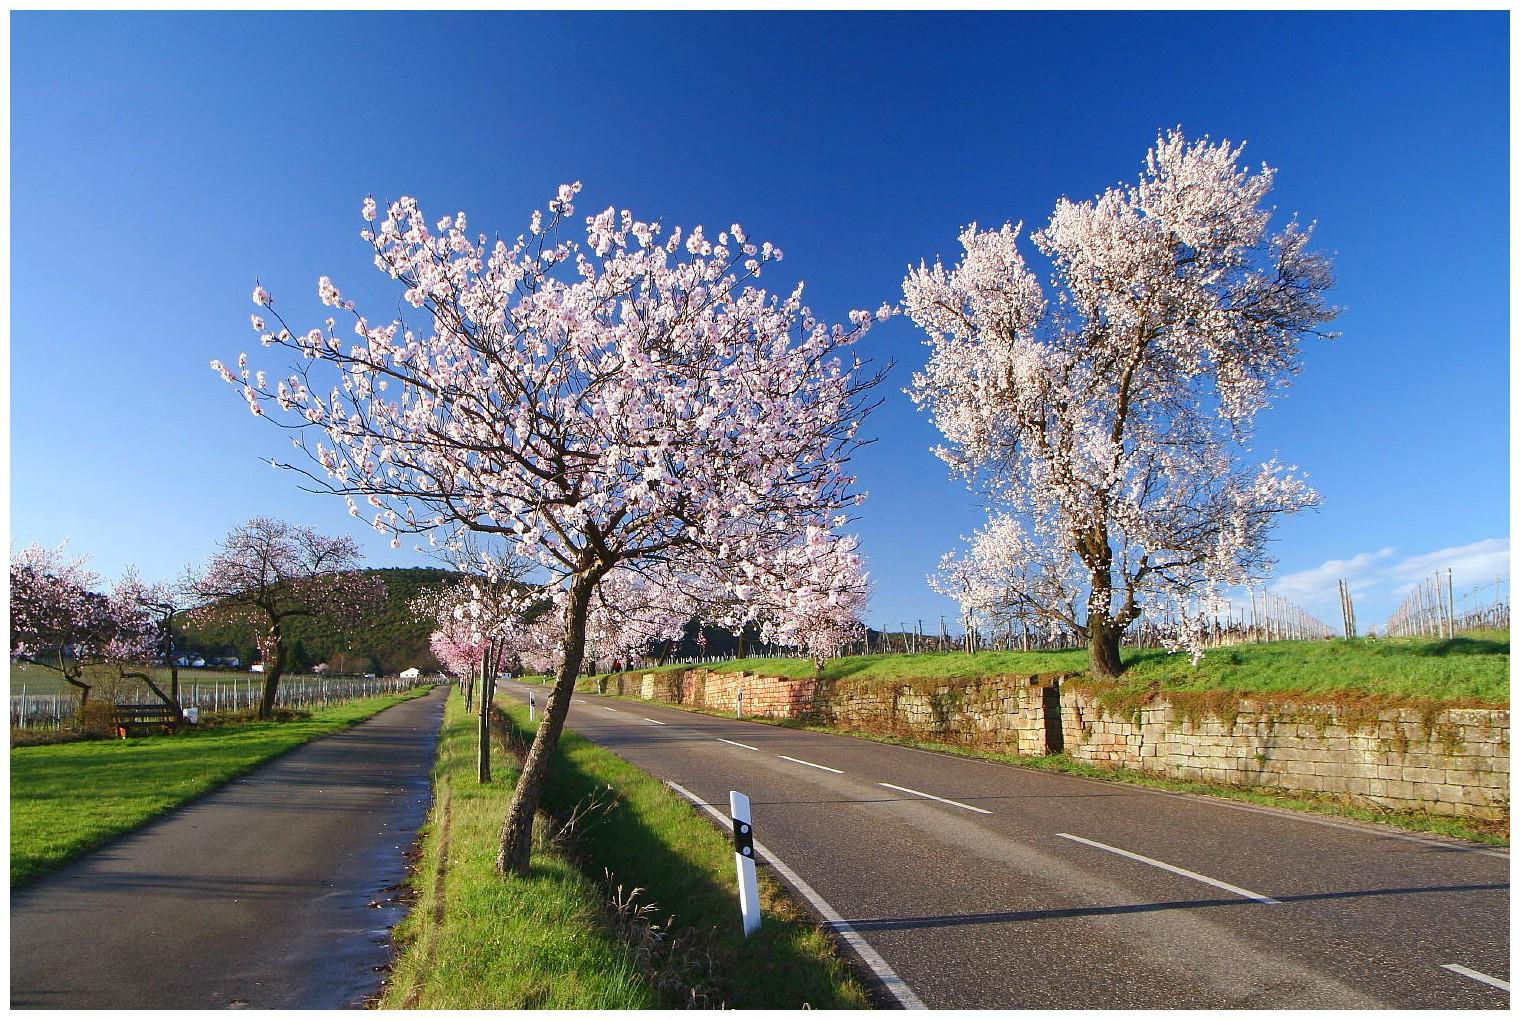 Die Pfalz im Blütenrausch I